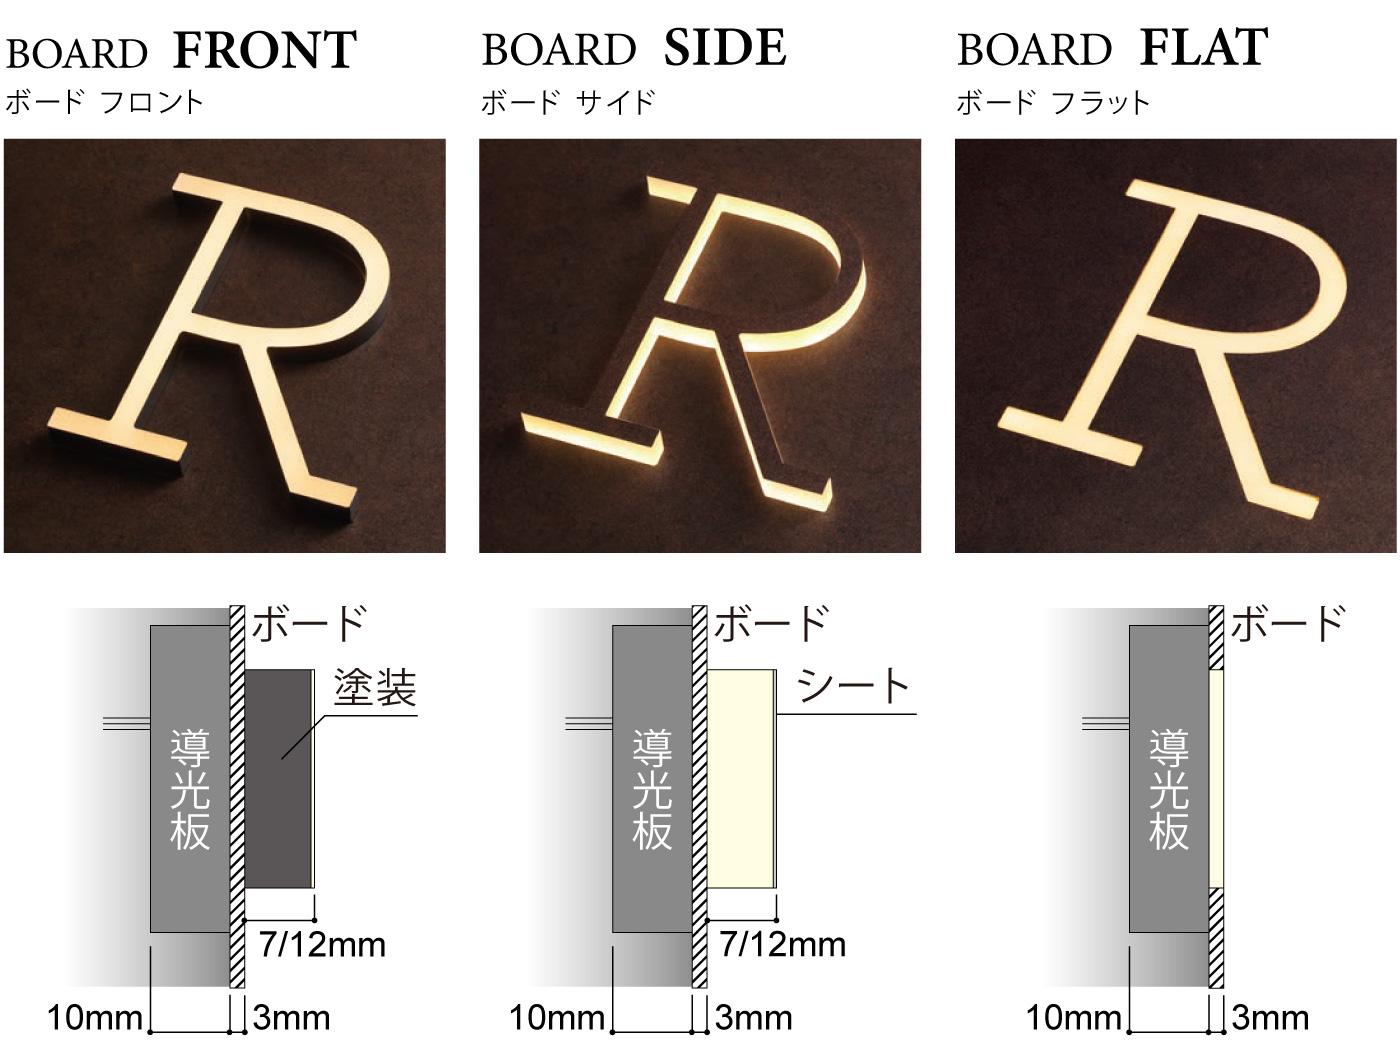 LEDIUS SIGN BOARD FRONT / SIDE / FLATの商品イメージ・仕様の画像